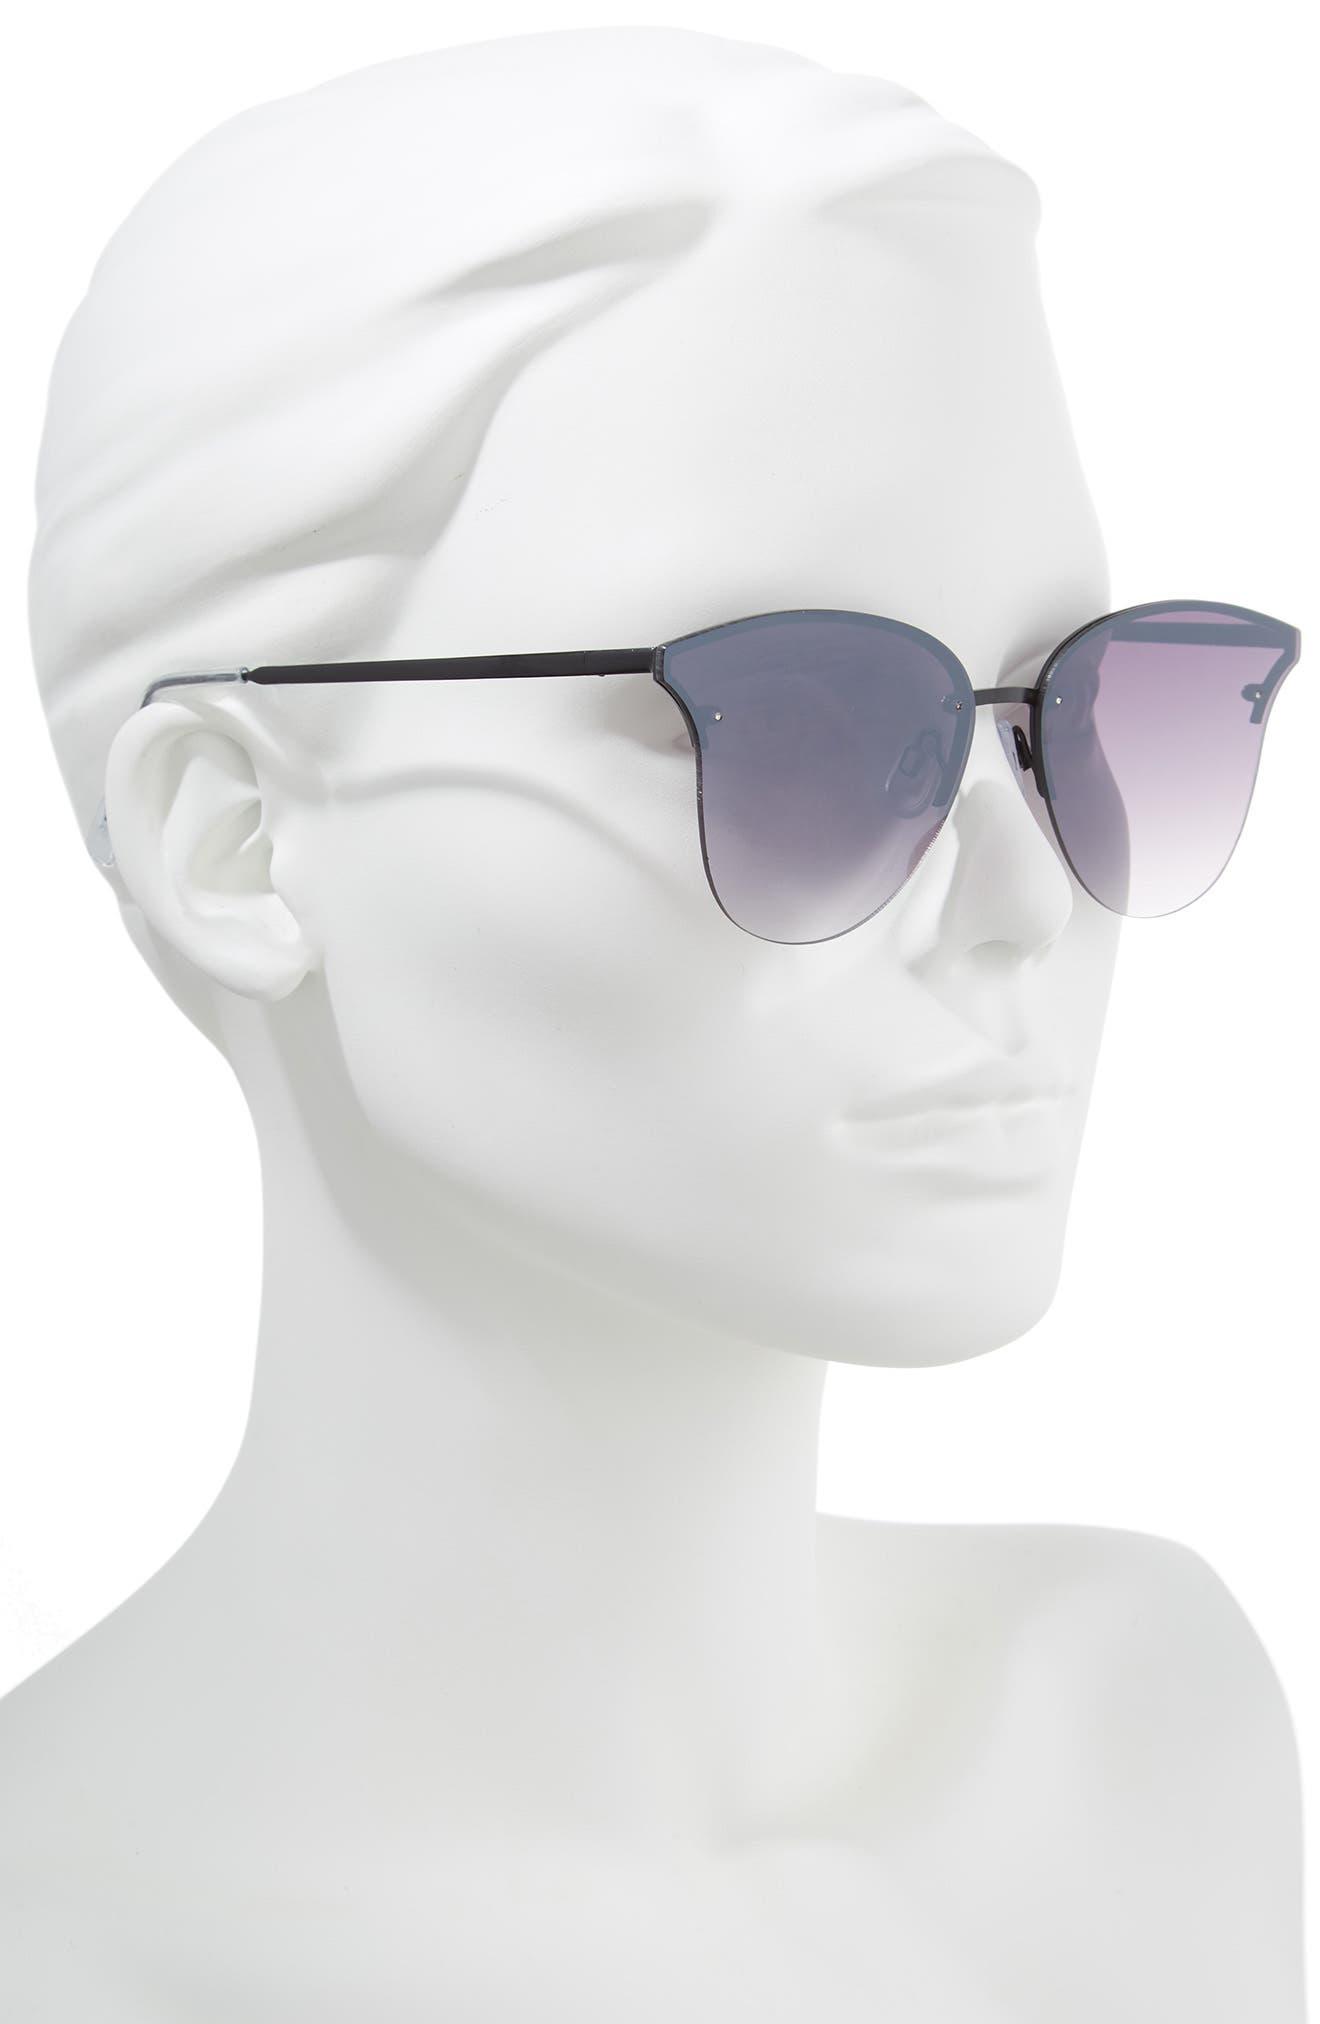 61mm Rimless Cat Eye Sunglasses,                             Alternate thumbnail 2, color,                             001